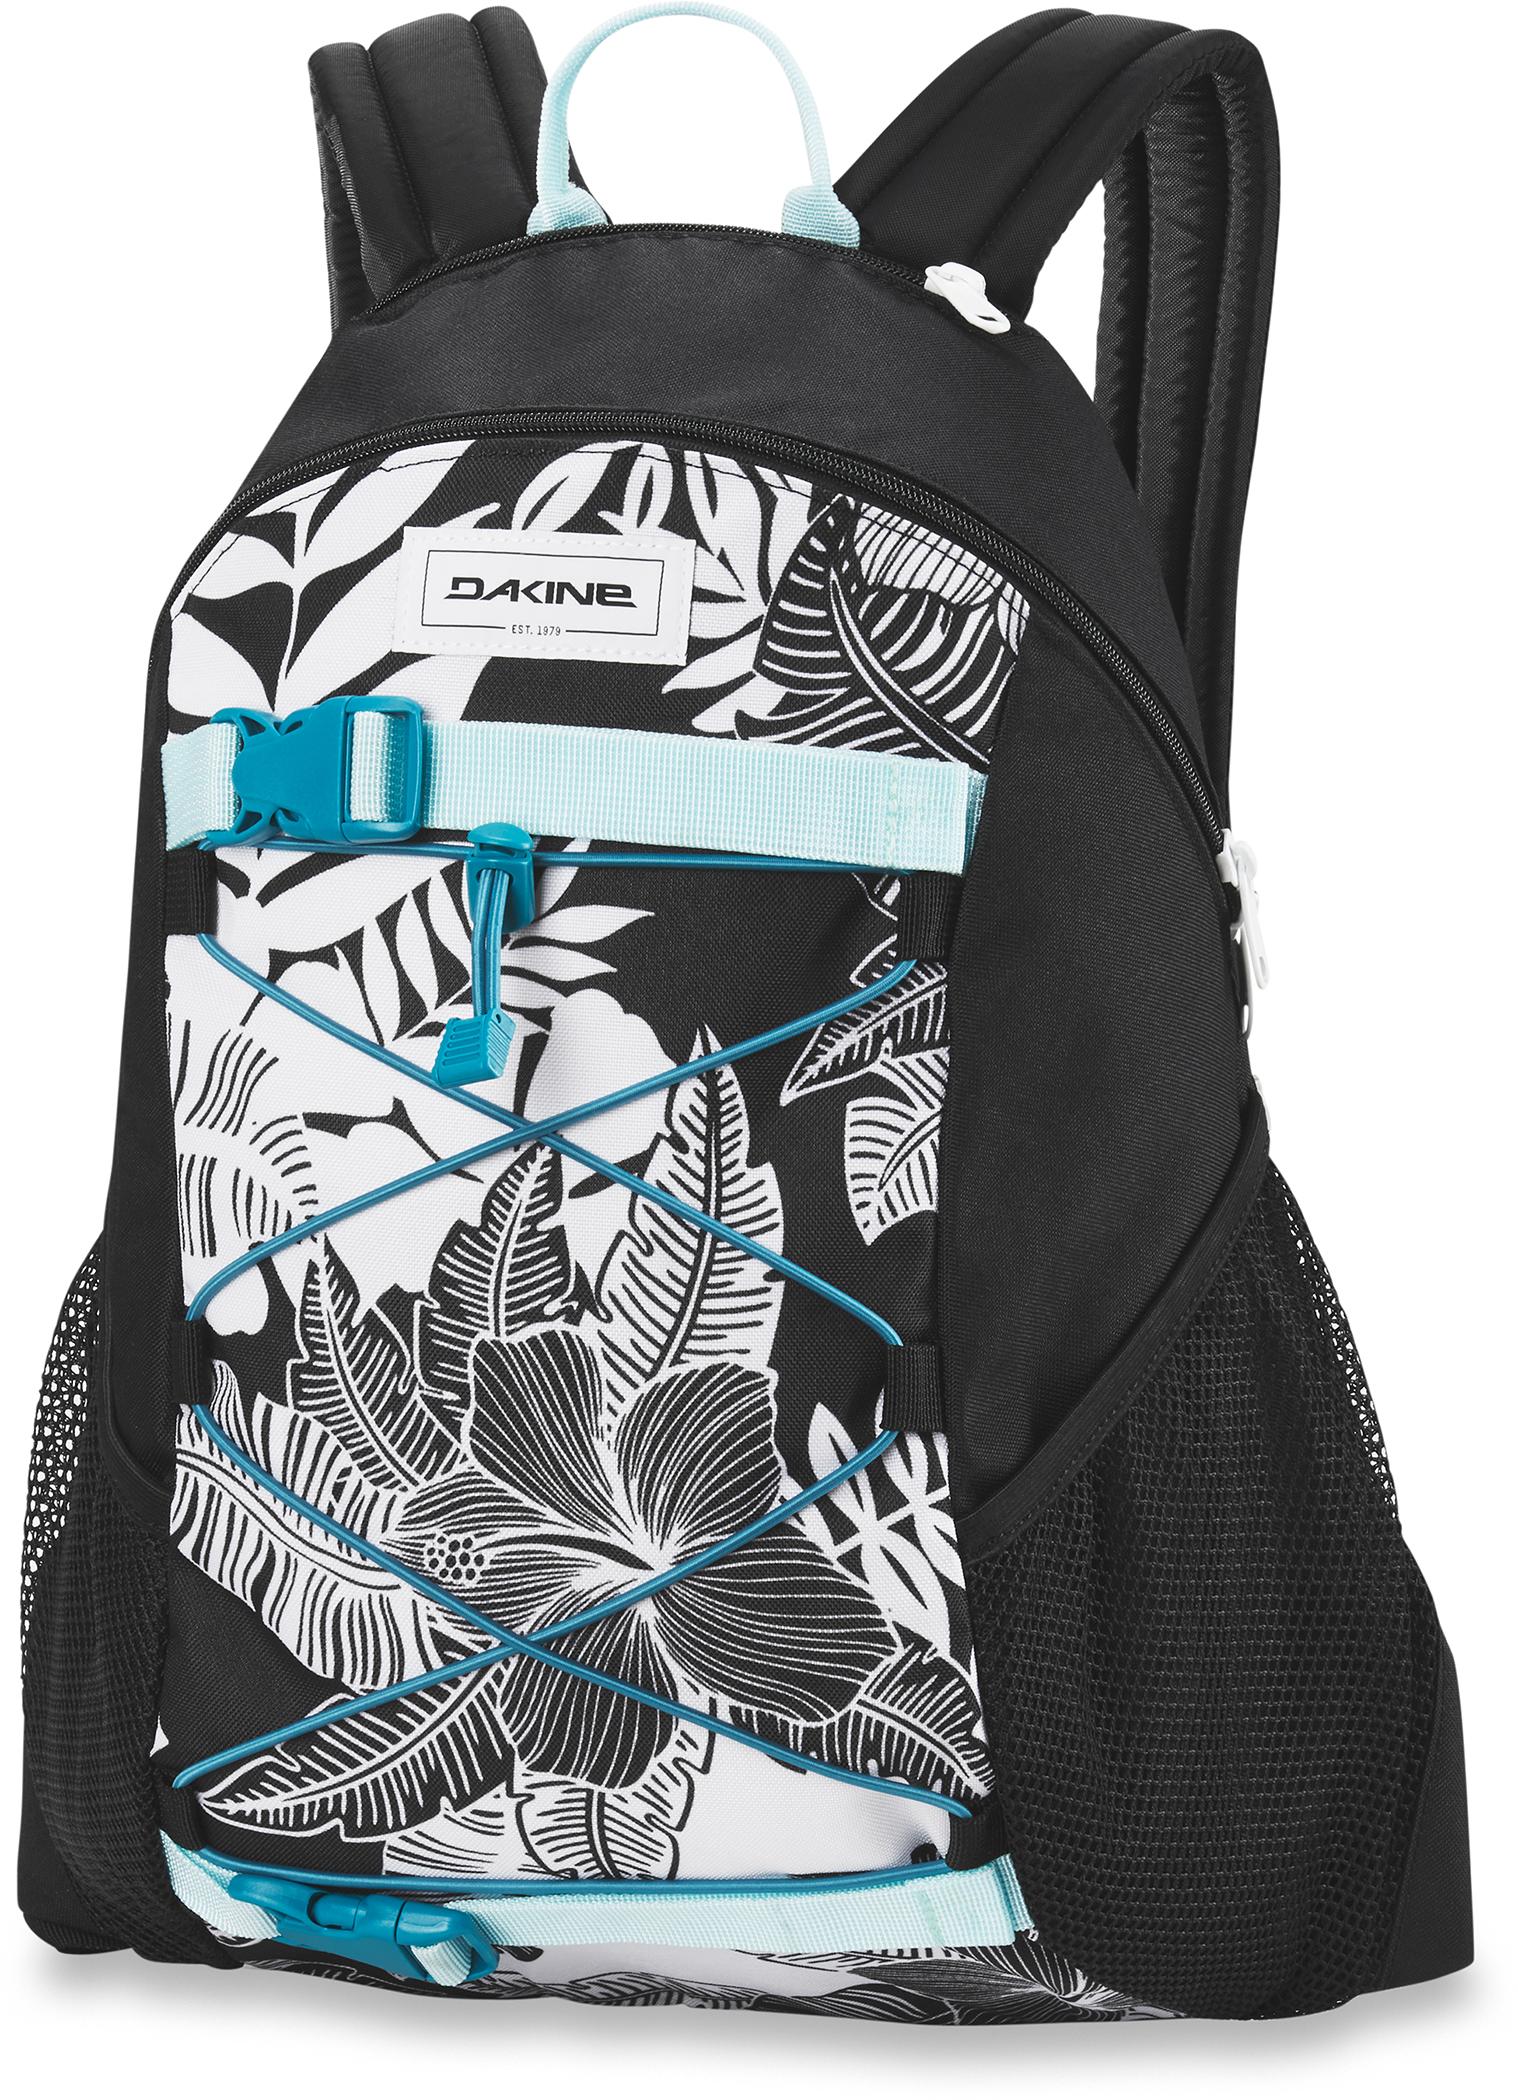 38e0049d9cc00 Dakine Women s Backpack - The Board Basement